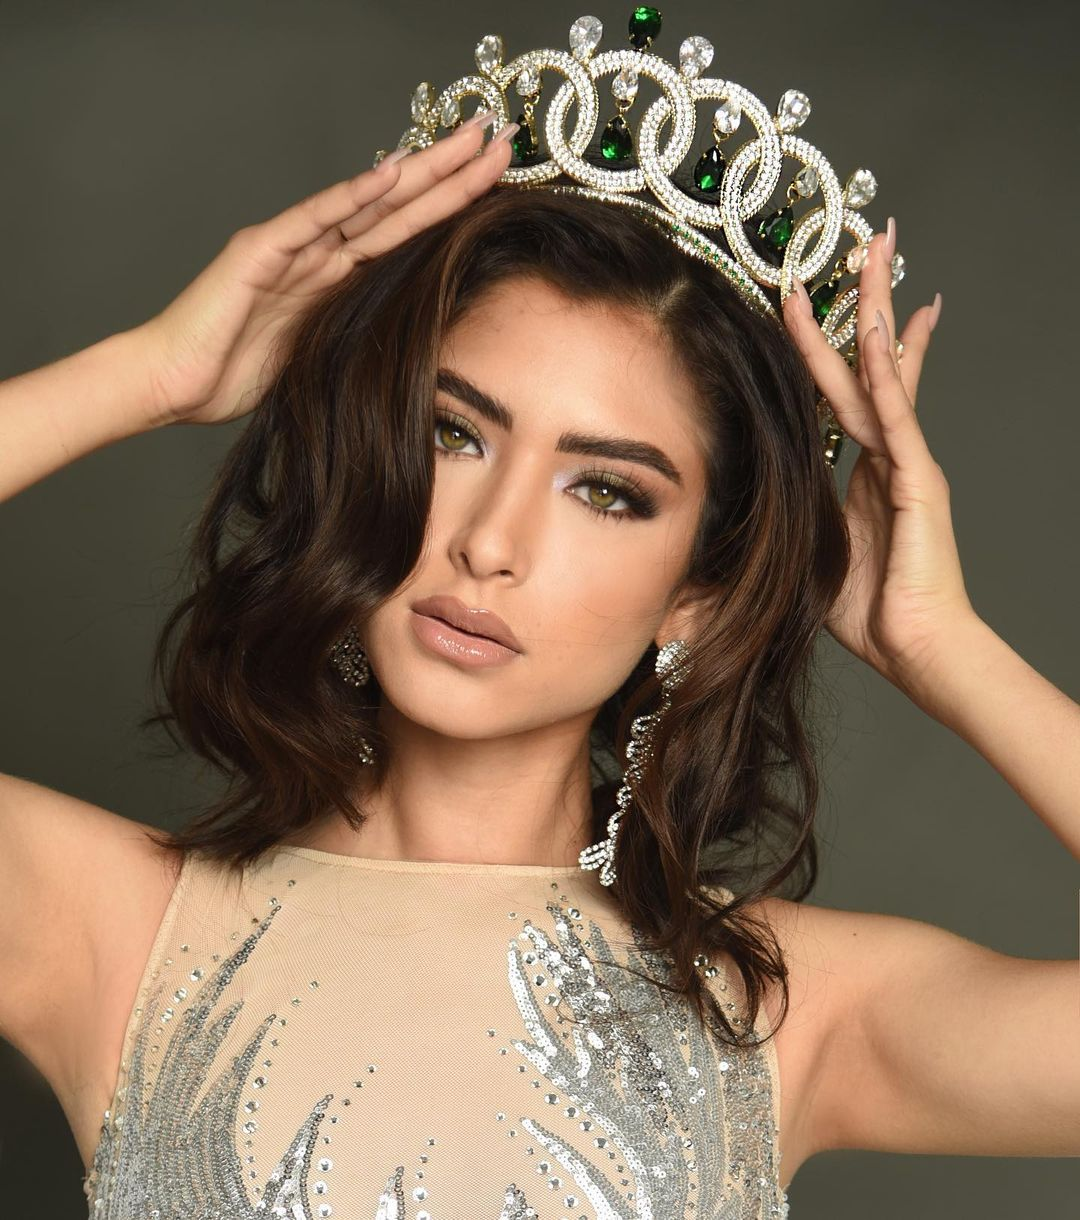 angela leon yuriar, miss grand mexico 2020. - Página 7 Wpshm10